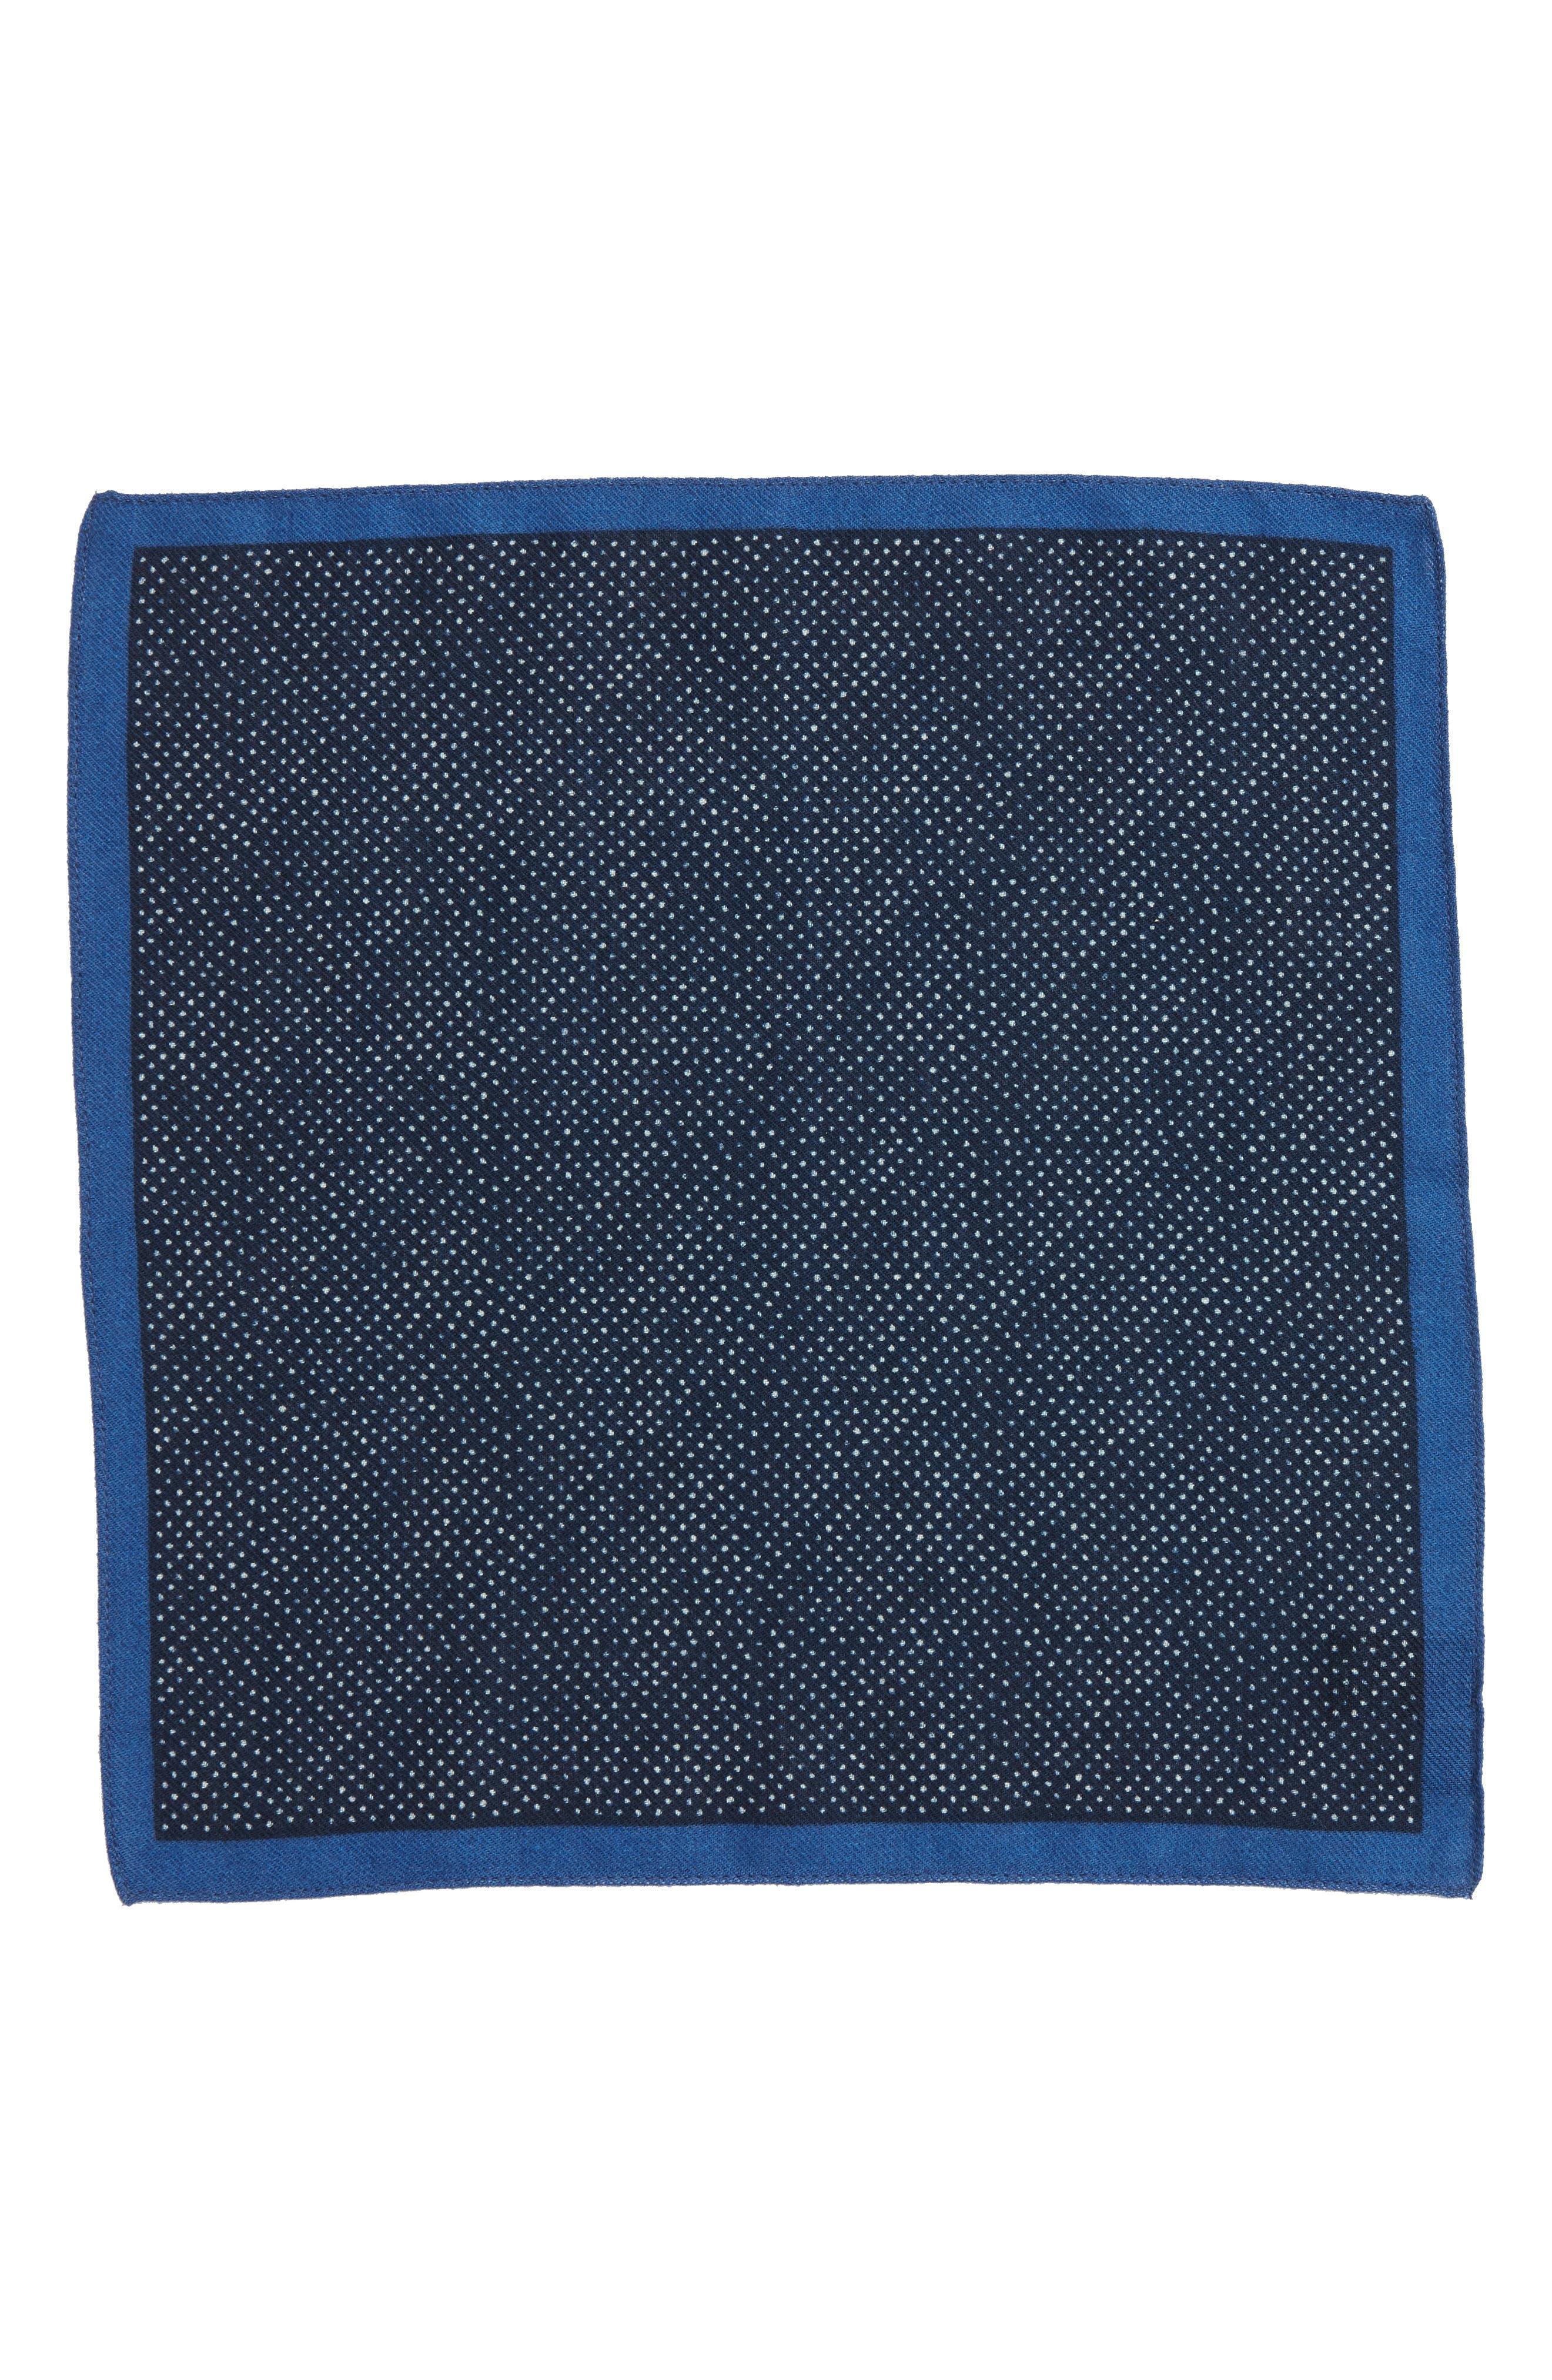 Dot Wool Pocket Square,                             Alternate thumbnail 2, color,                             Navy